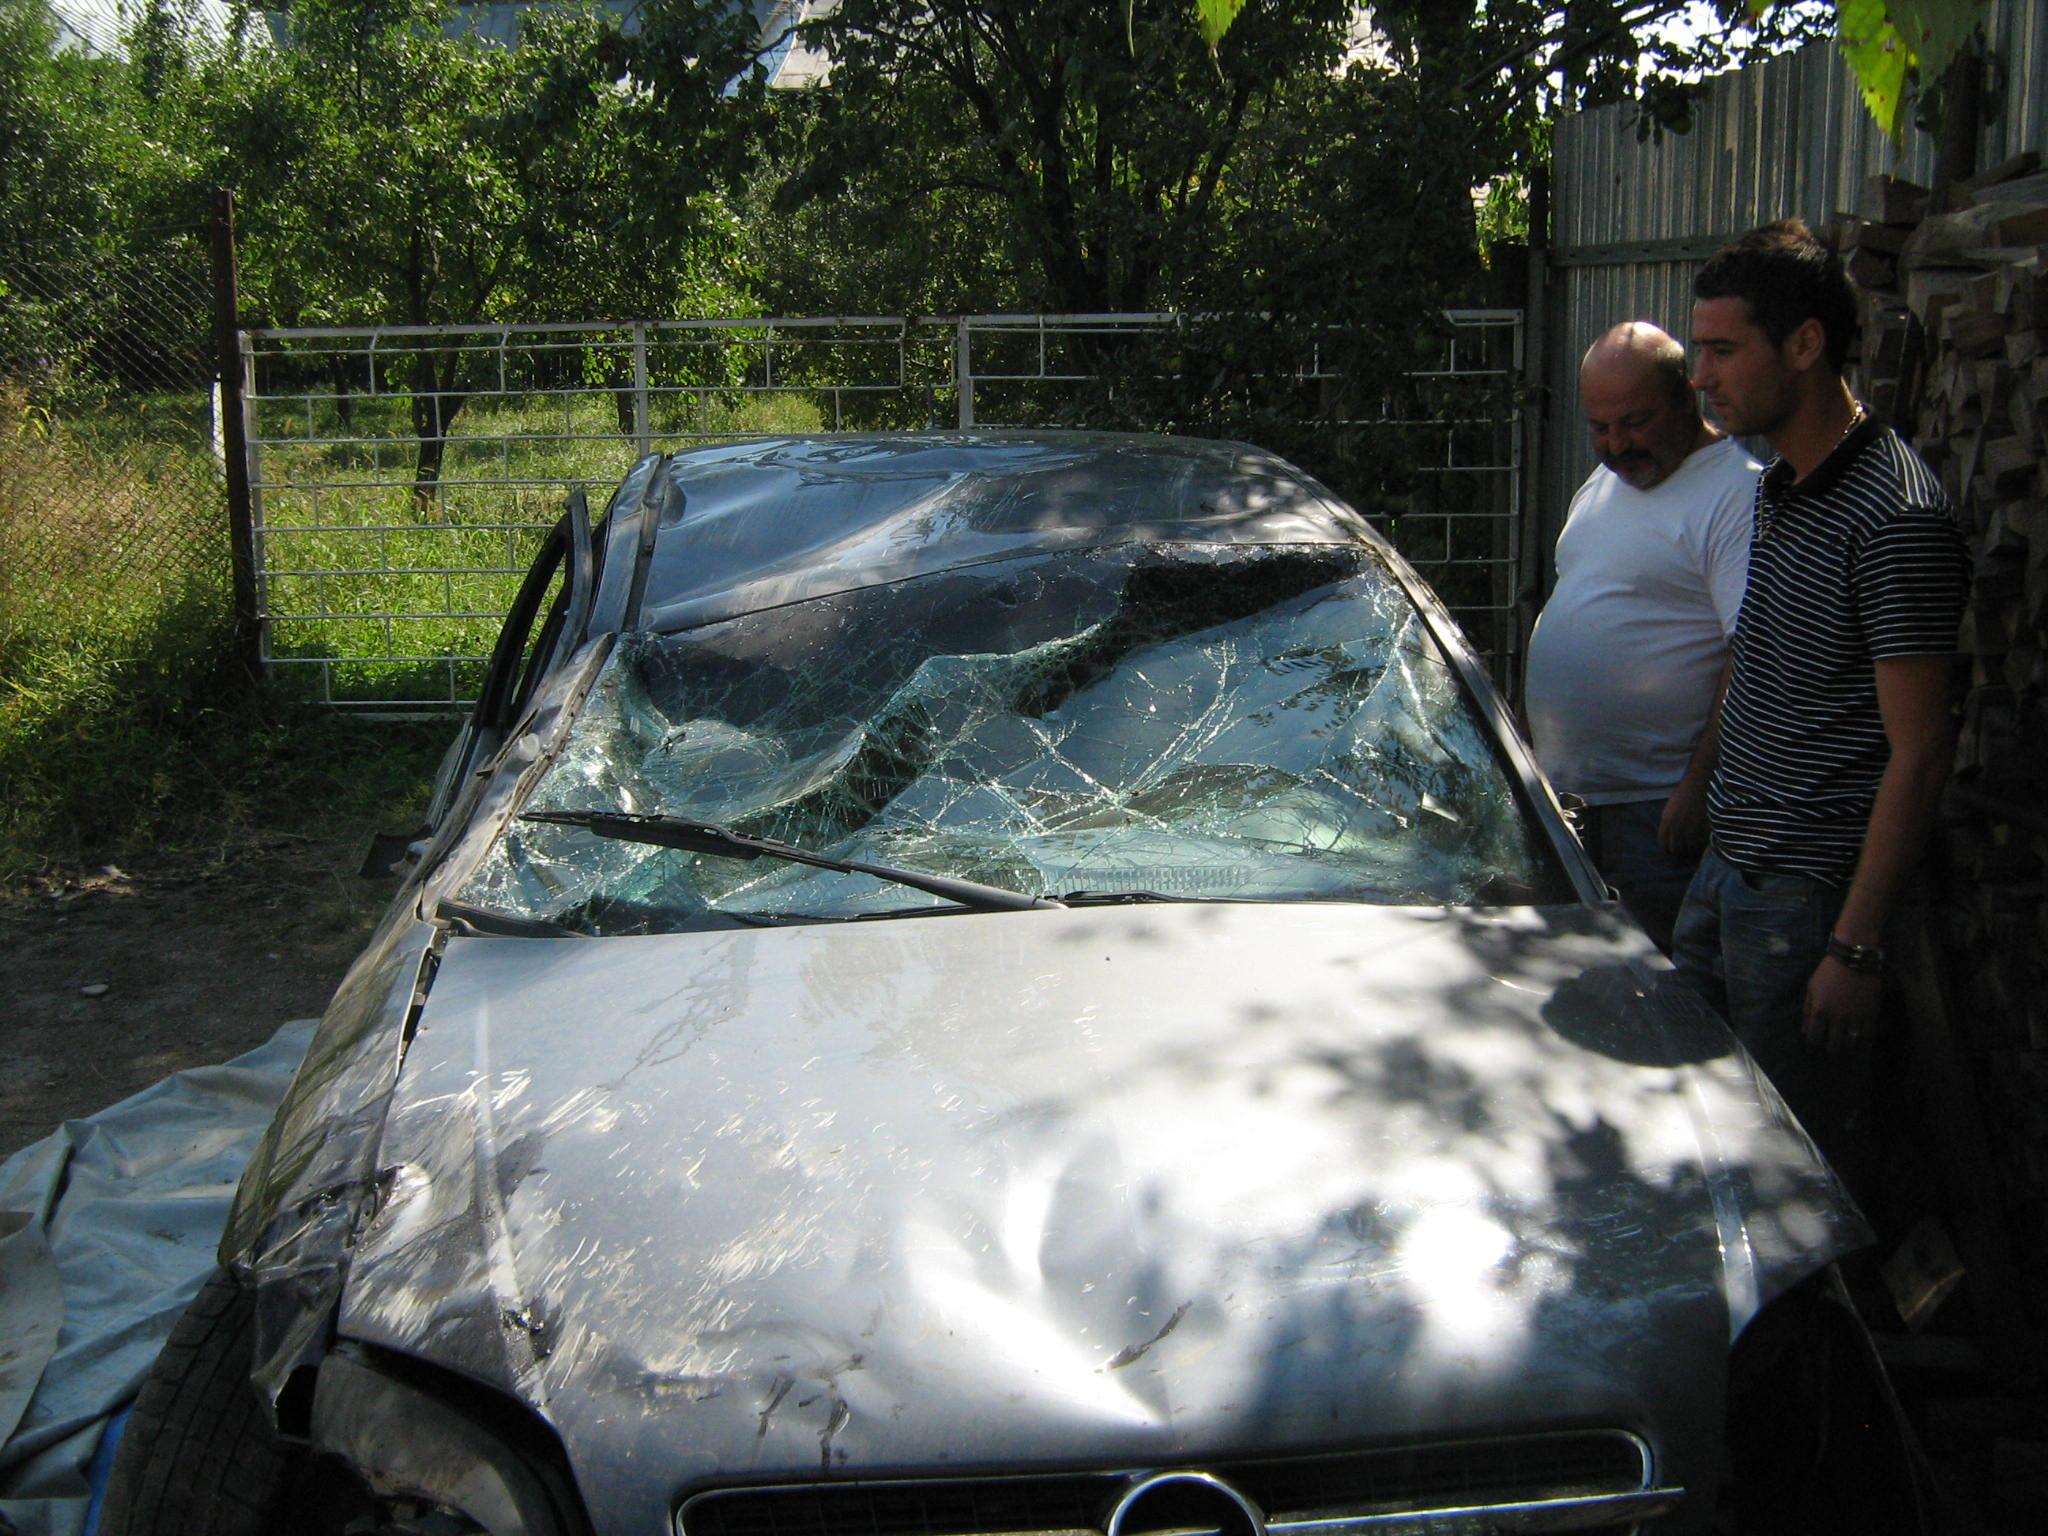 Opel Vectra avariat 2002 Diesel Hatchback - 30 Martie 2011 - Poza 4